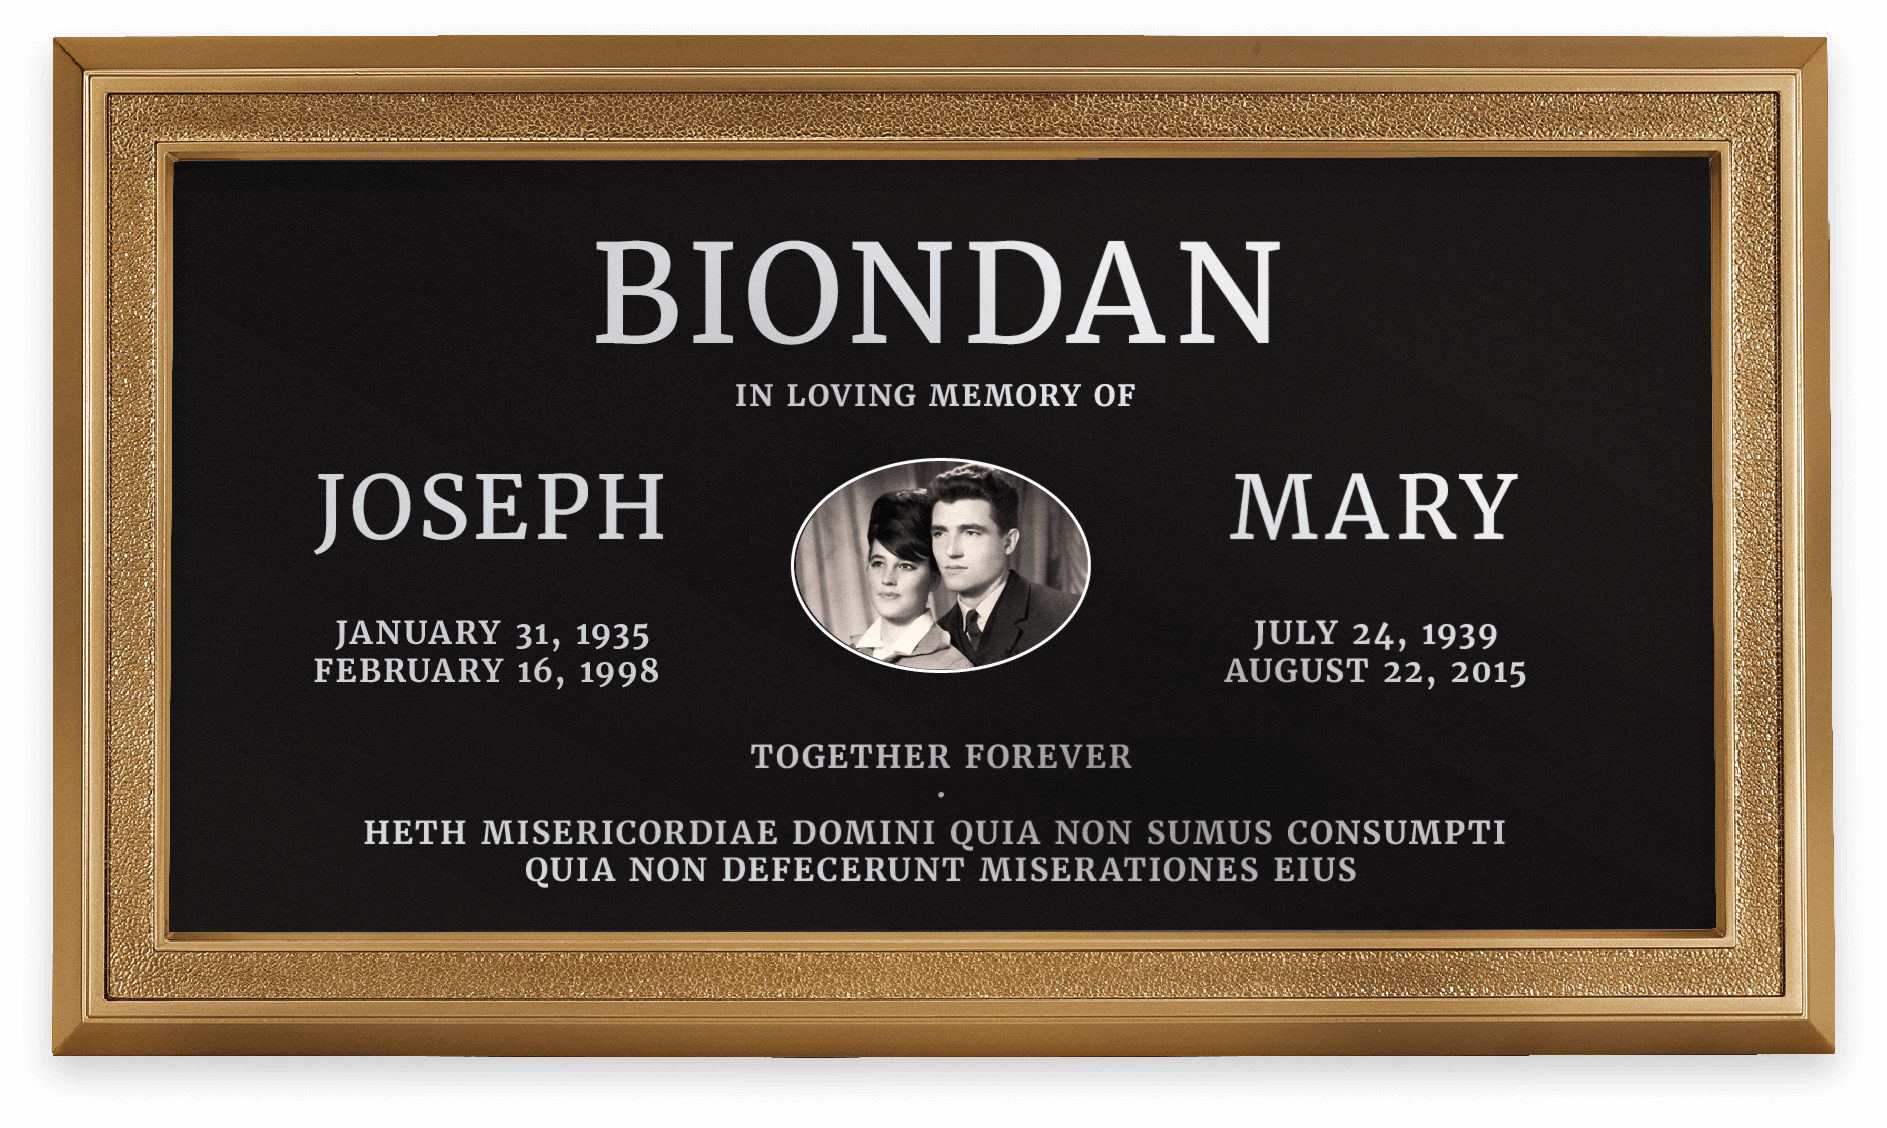 Biondan North America Cemetery Solutions